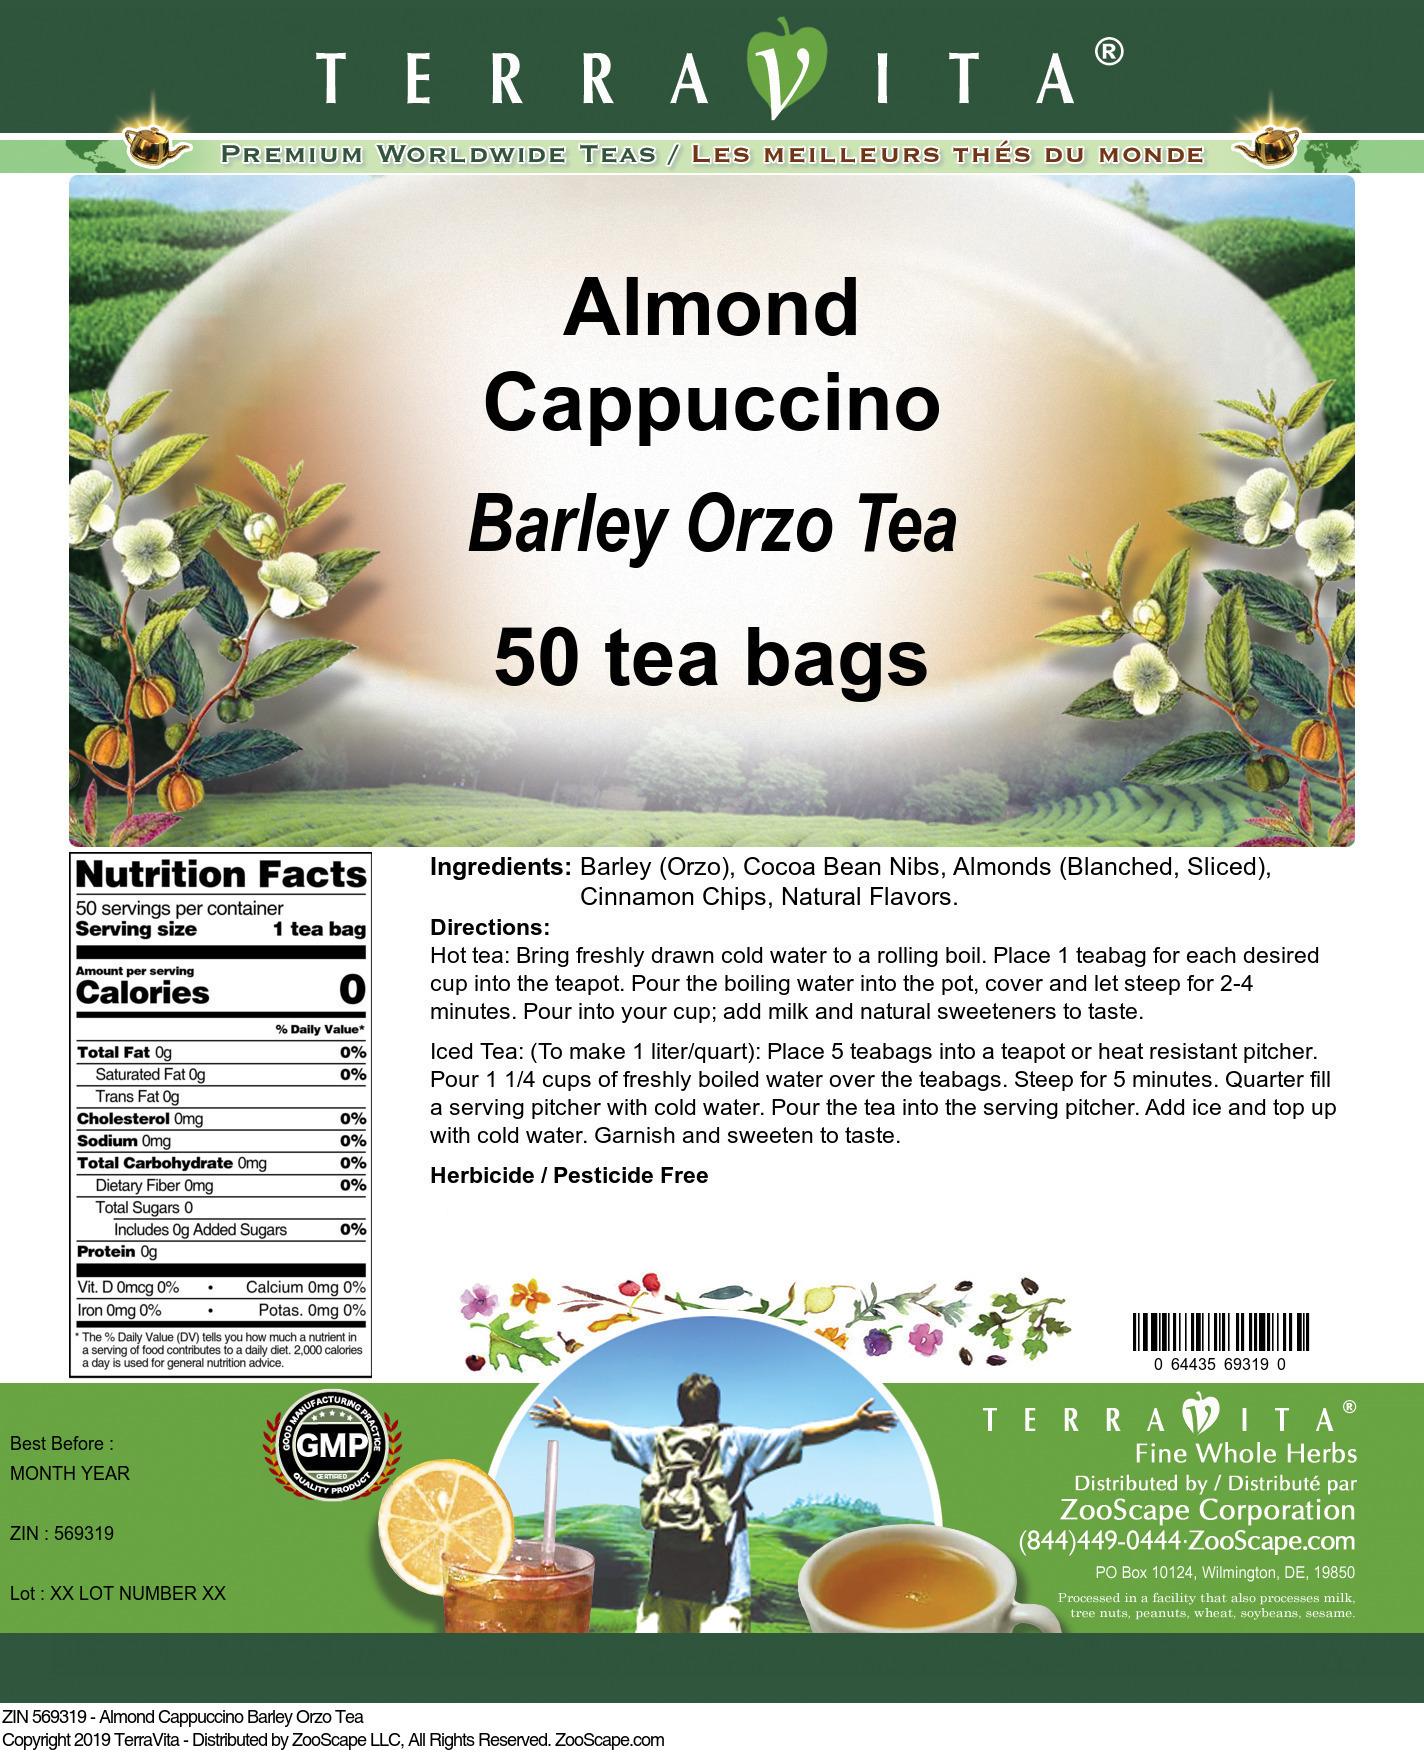 Almond Cappuccino Barley Orzo